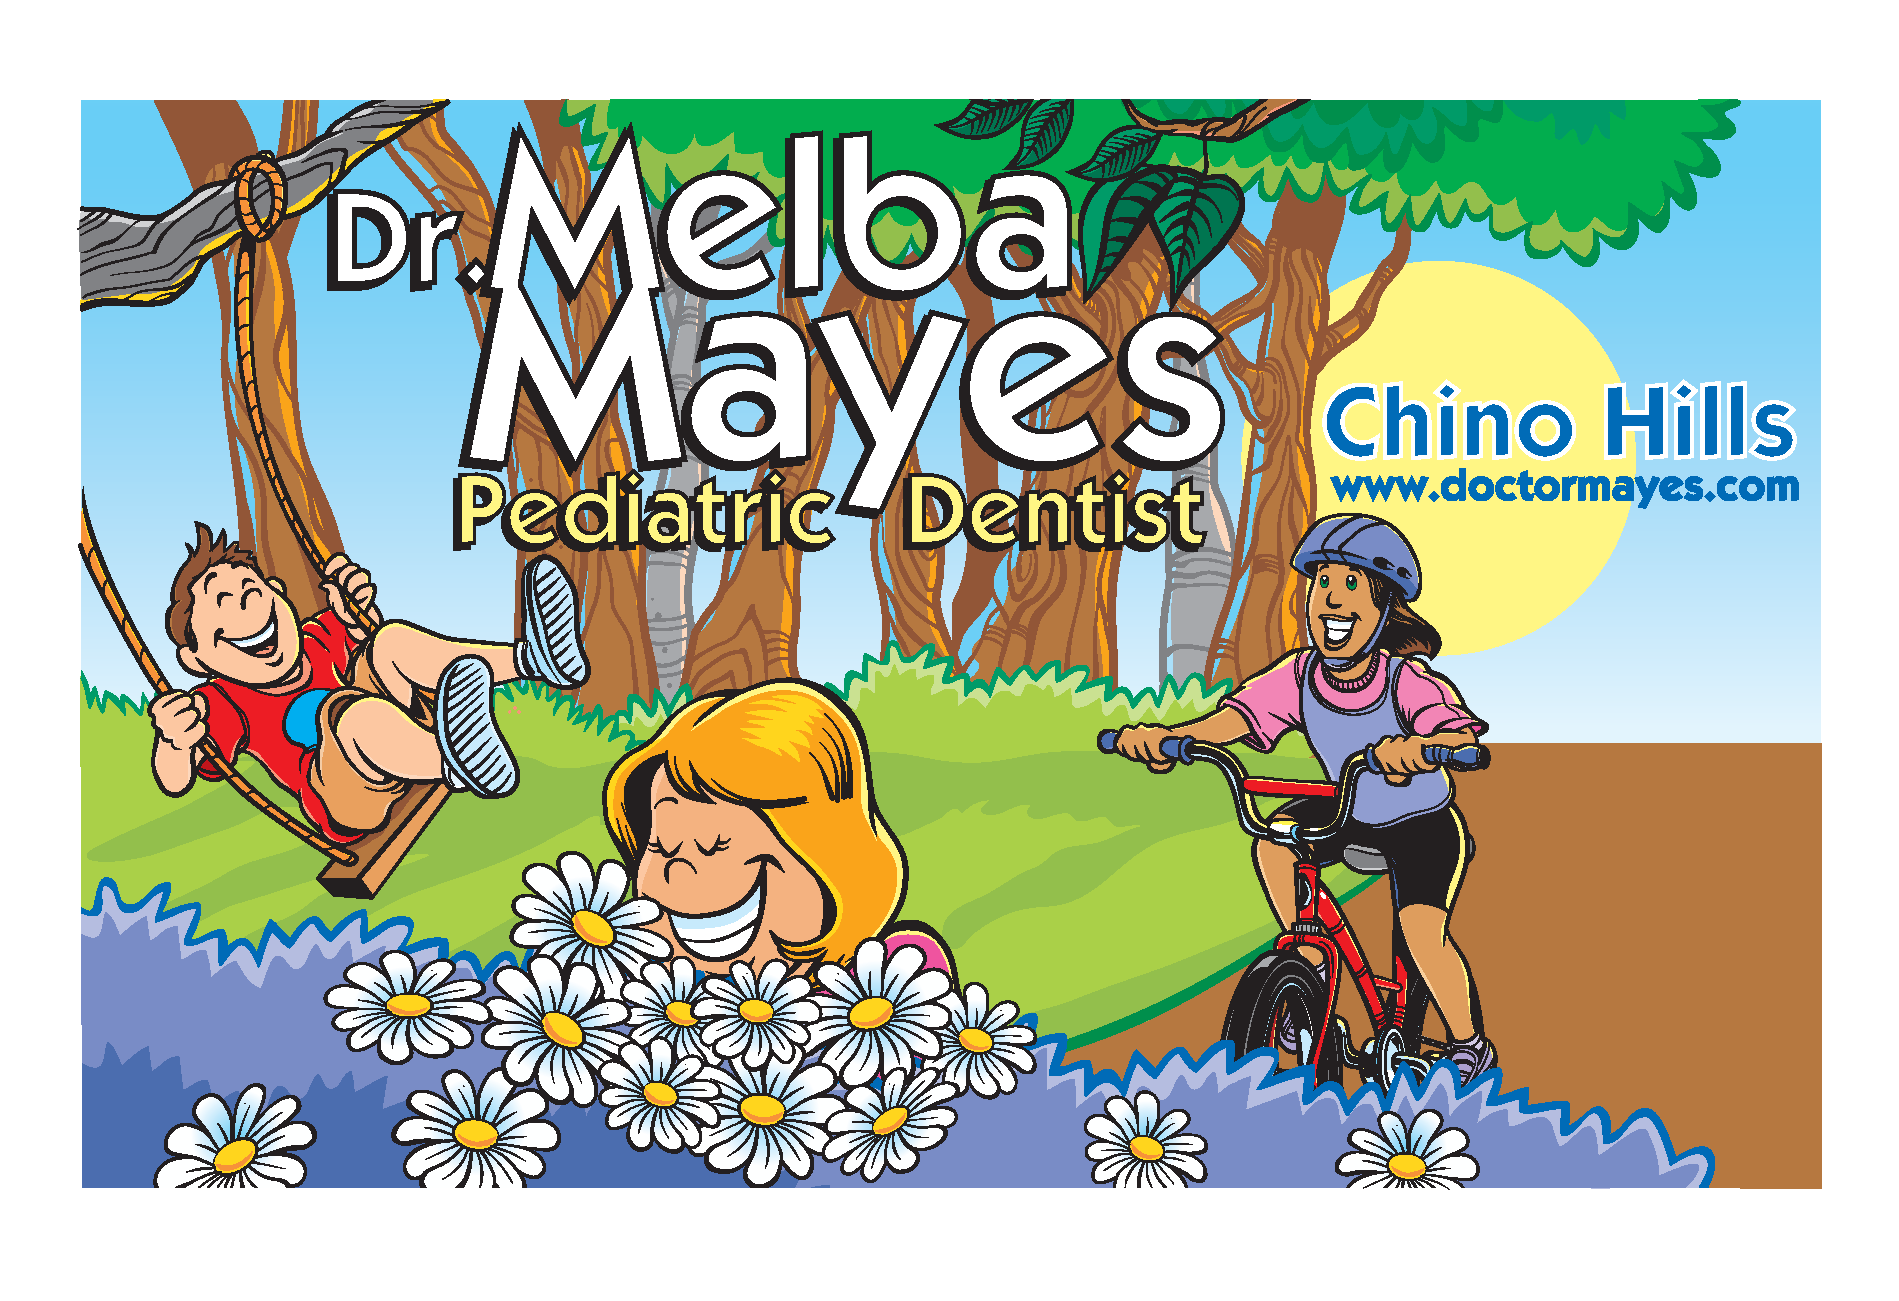 Dr. Melba Mayes